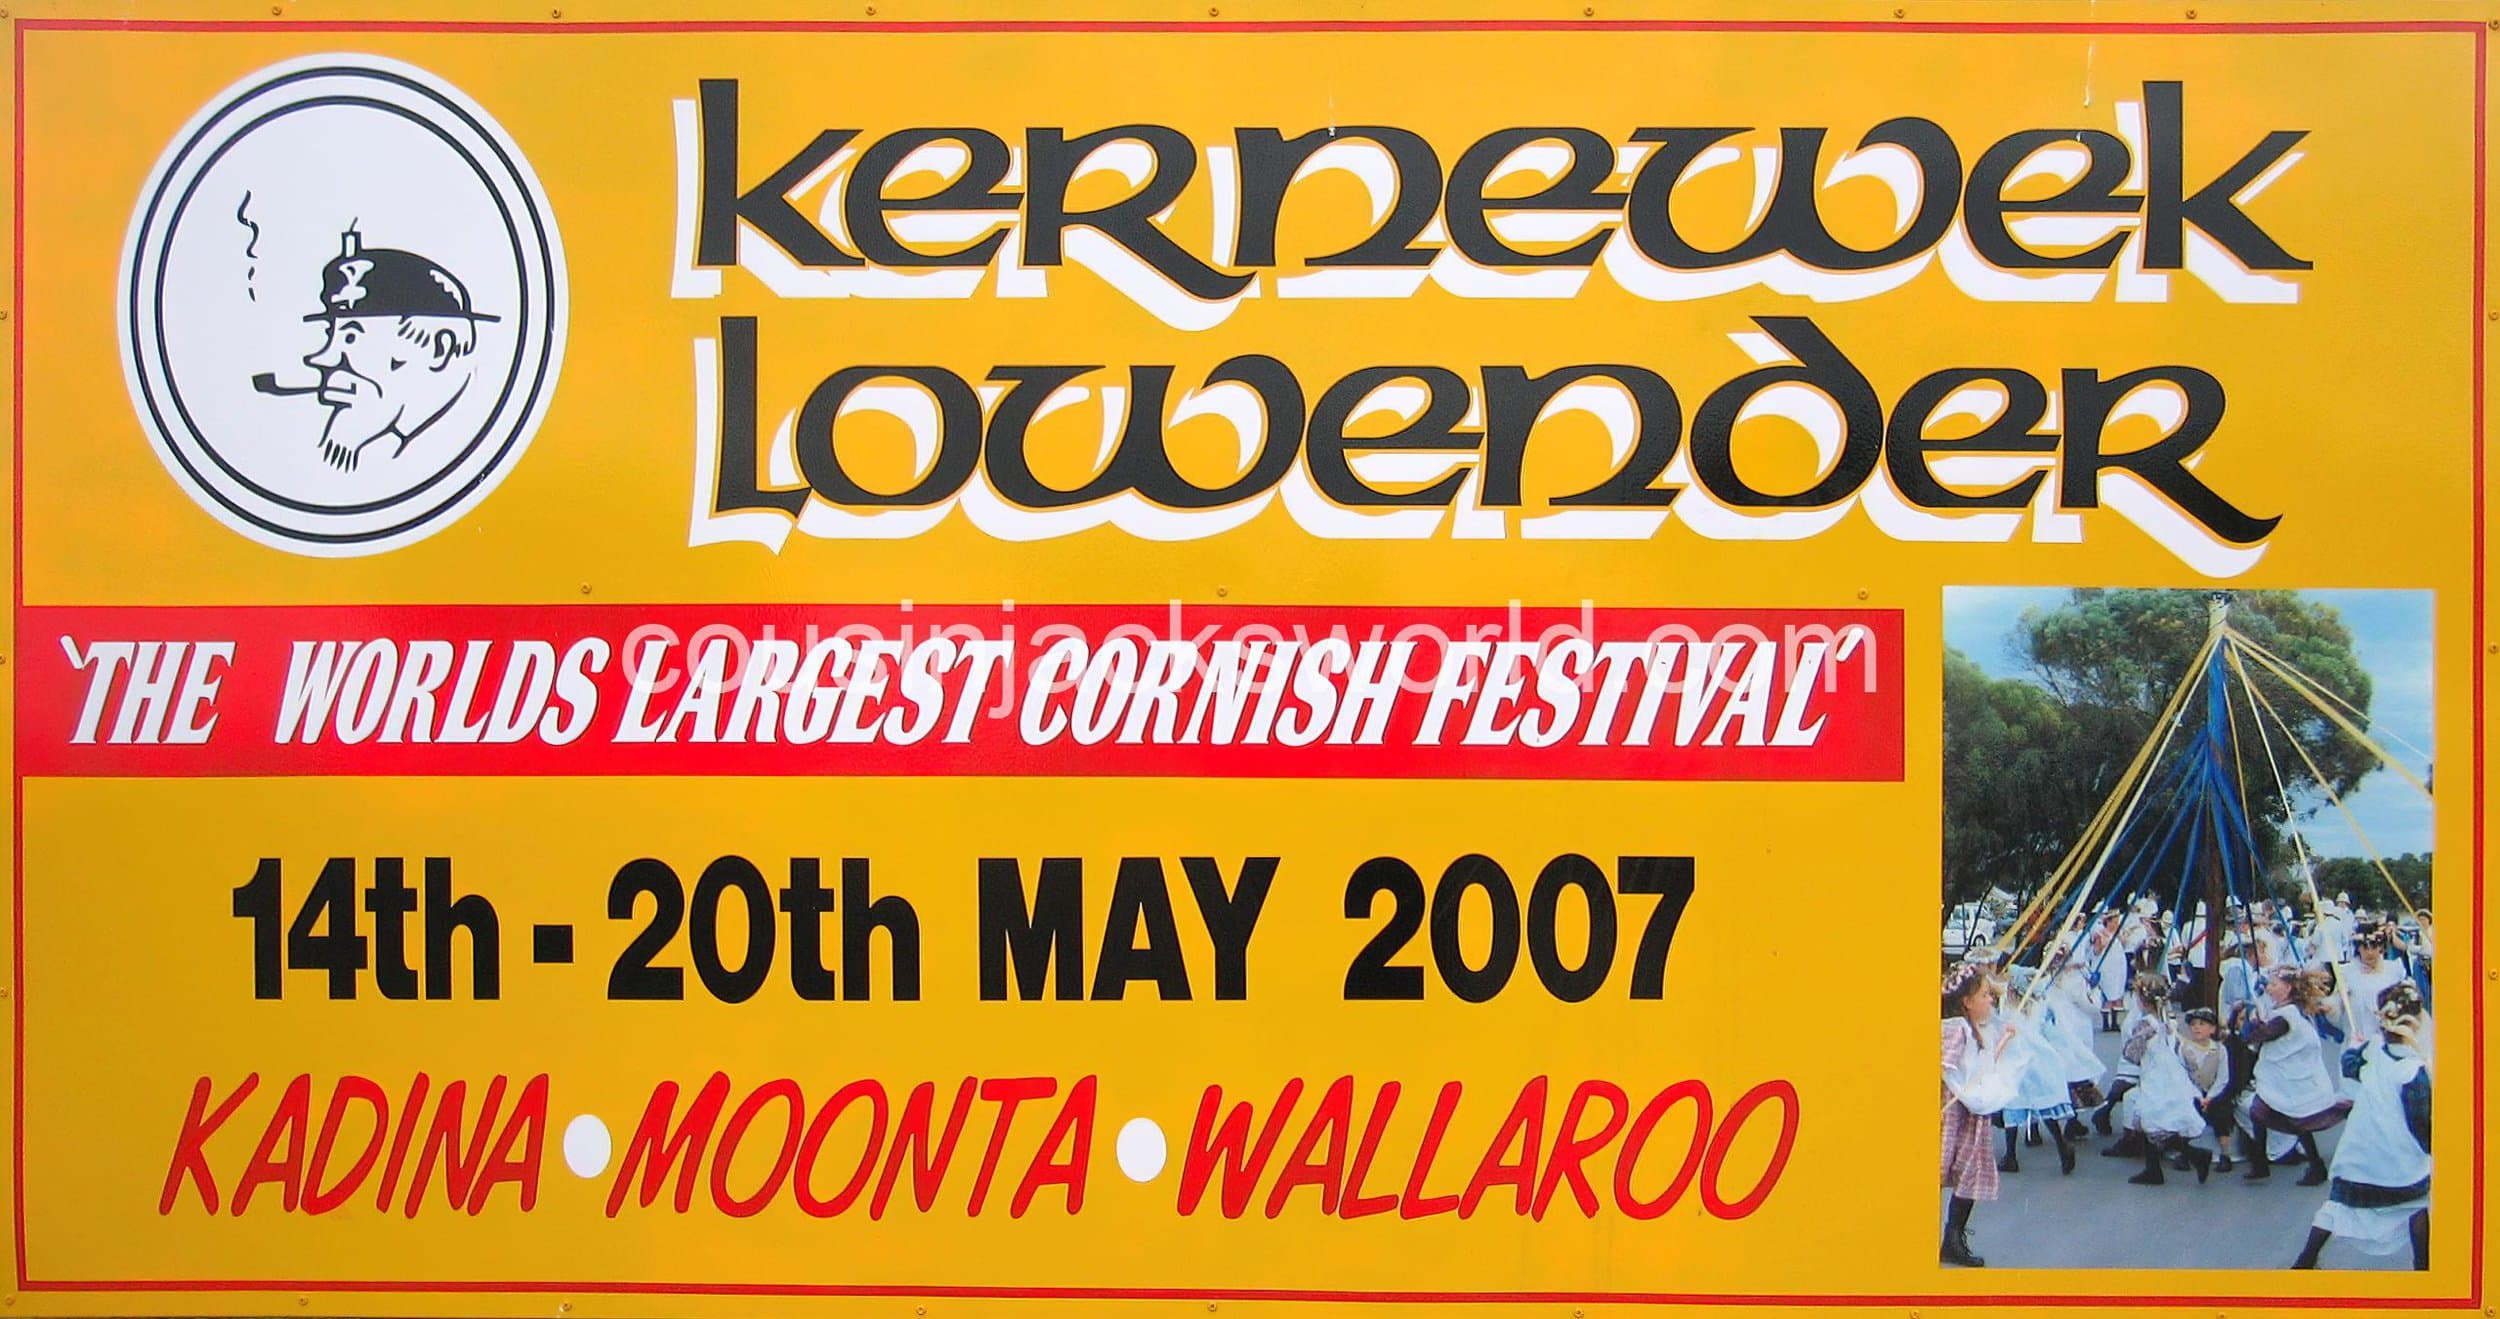 Cornish Lowender festival in South Australia. A legacy of Cornish mining migration